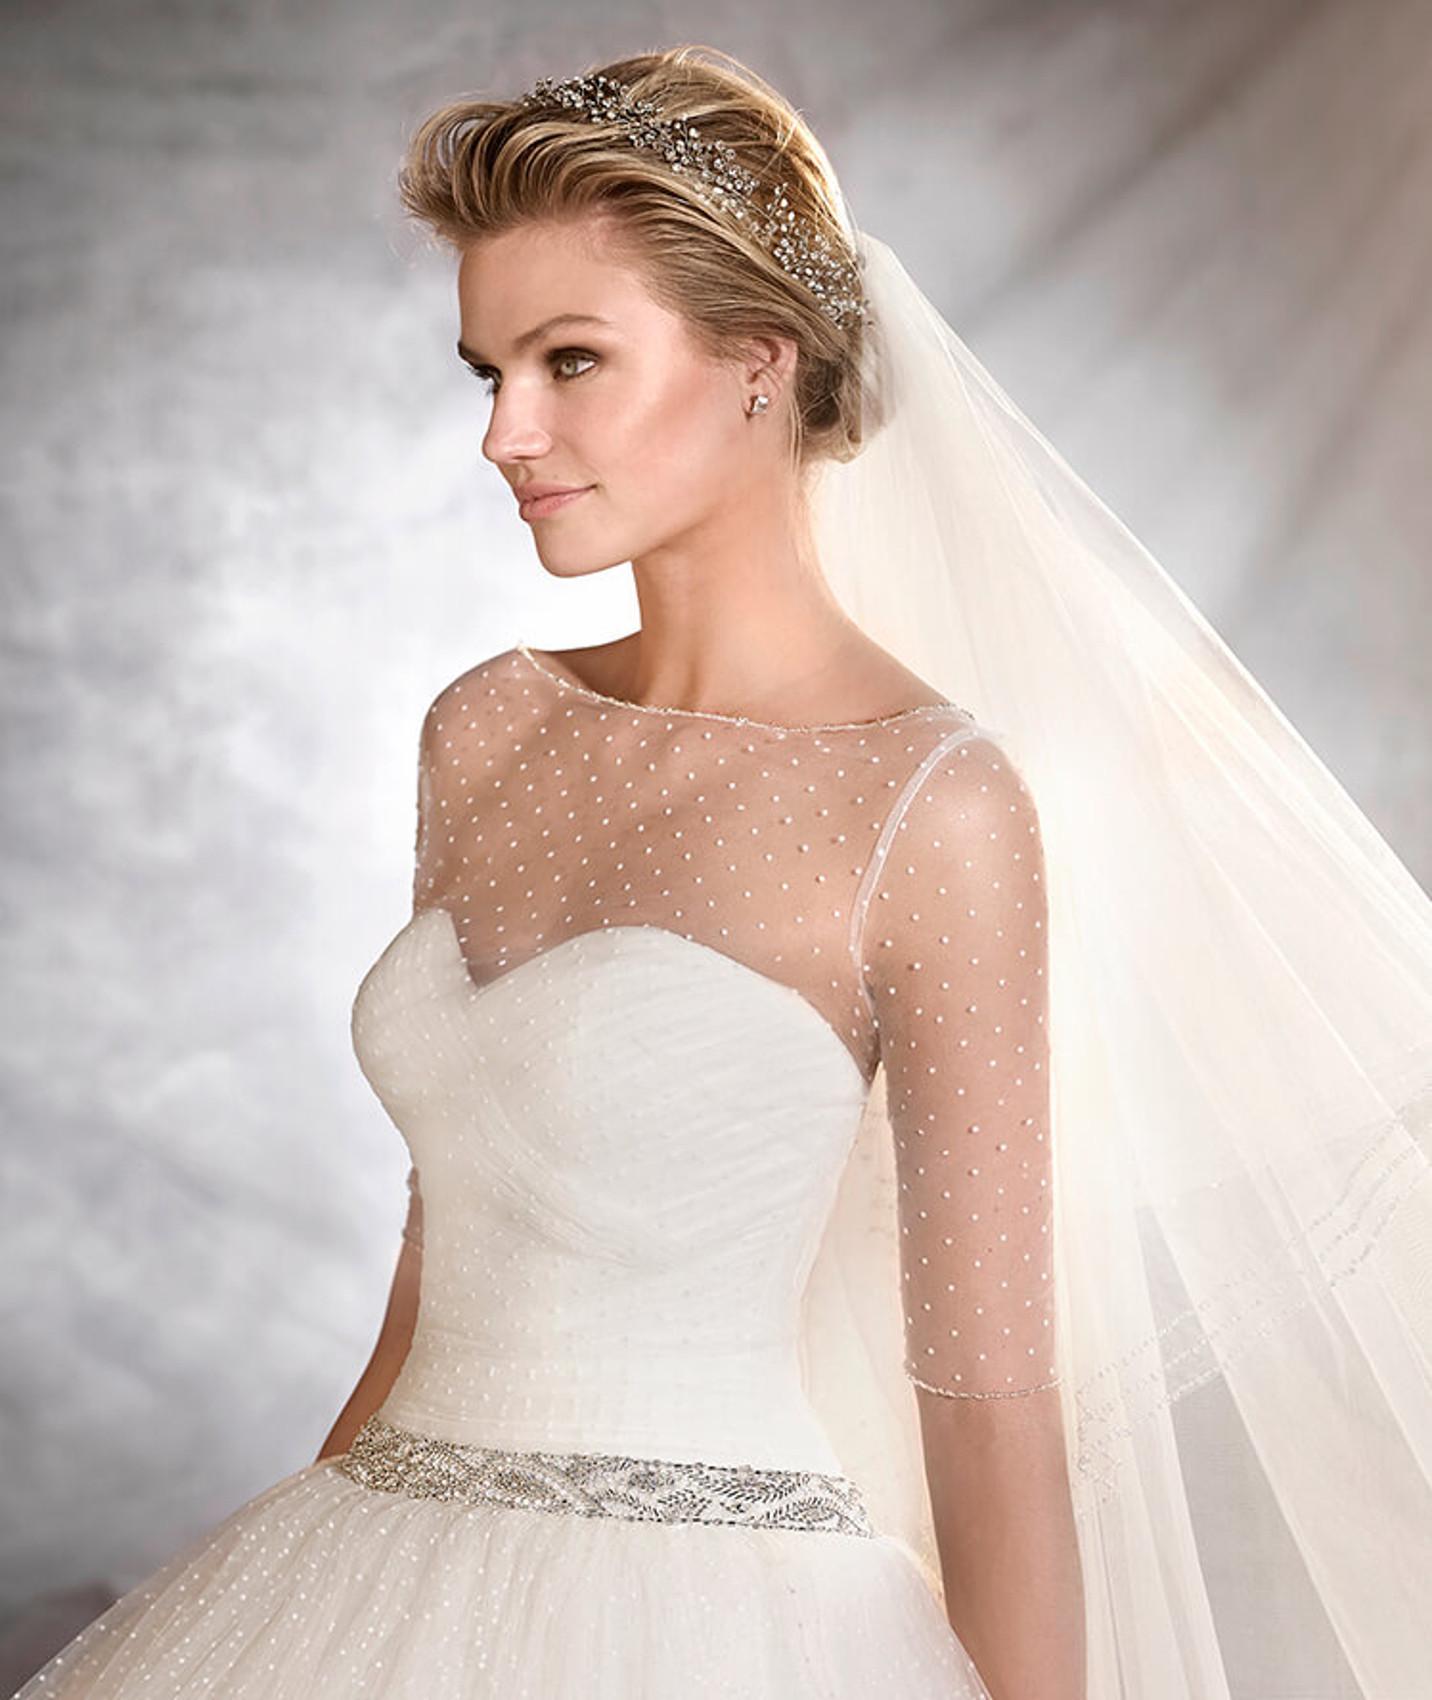 vestuvines sukneles 2018 metu tendencijos 1